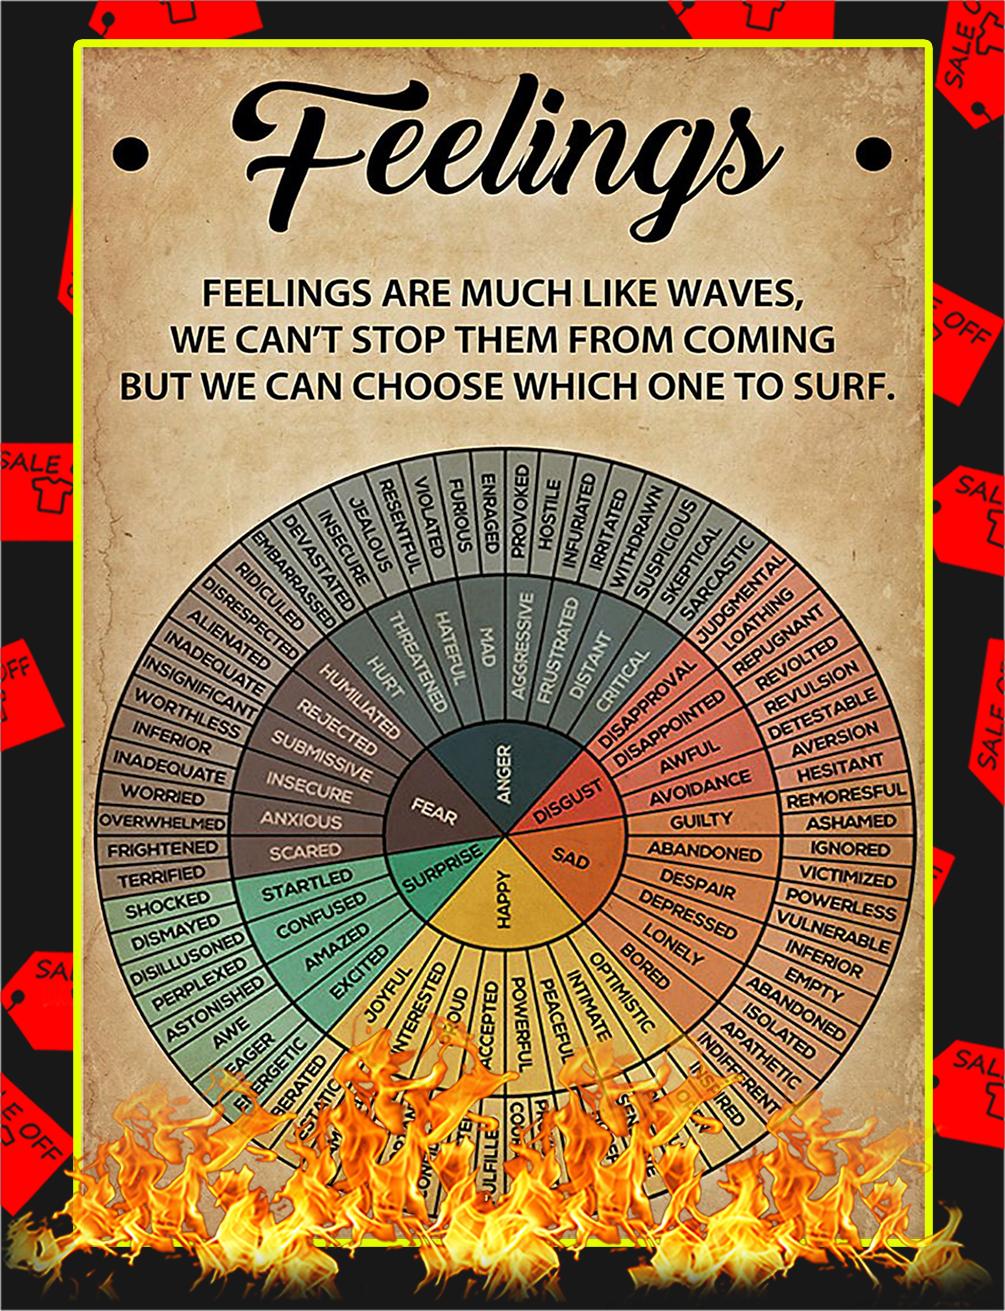 Feelings Wheel Feelings Are Much Like Waves Poster - A3